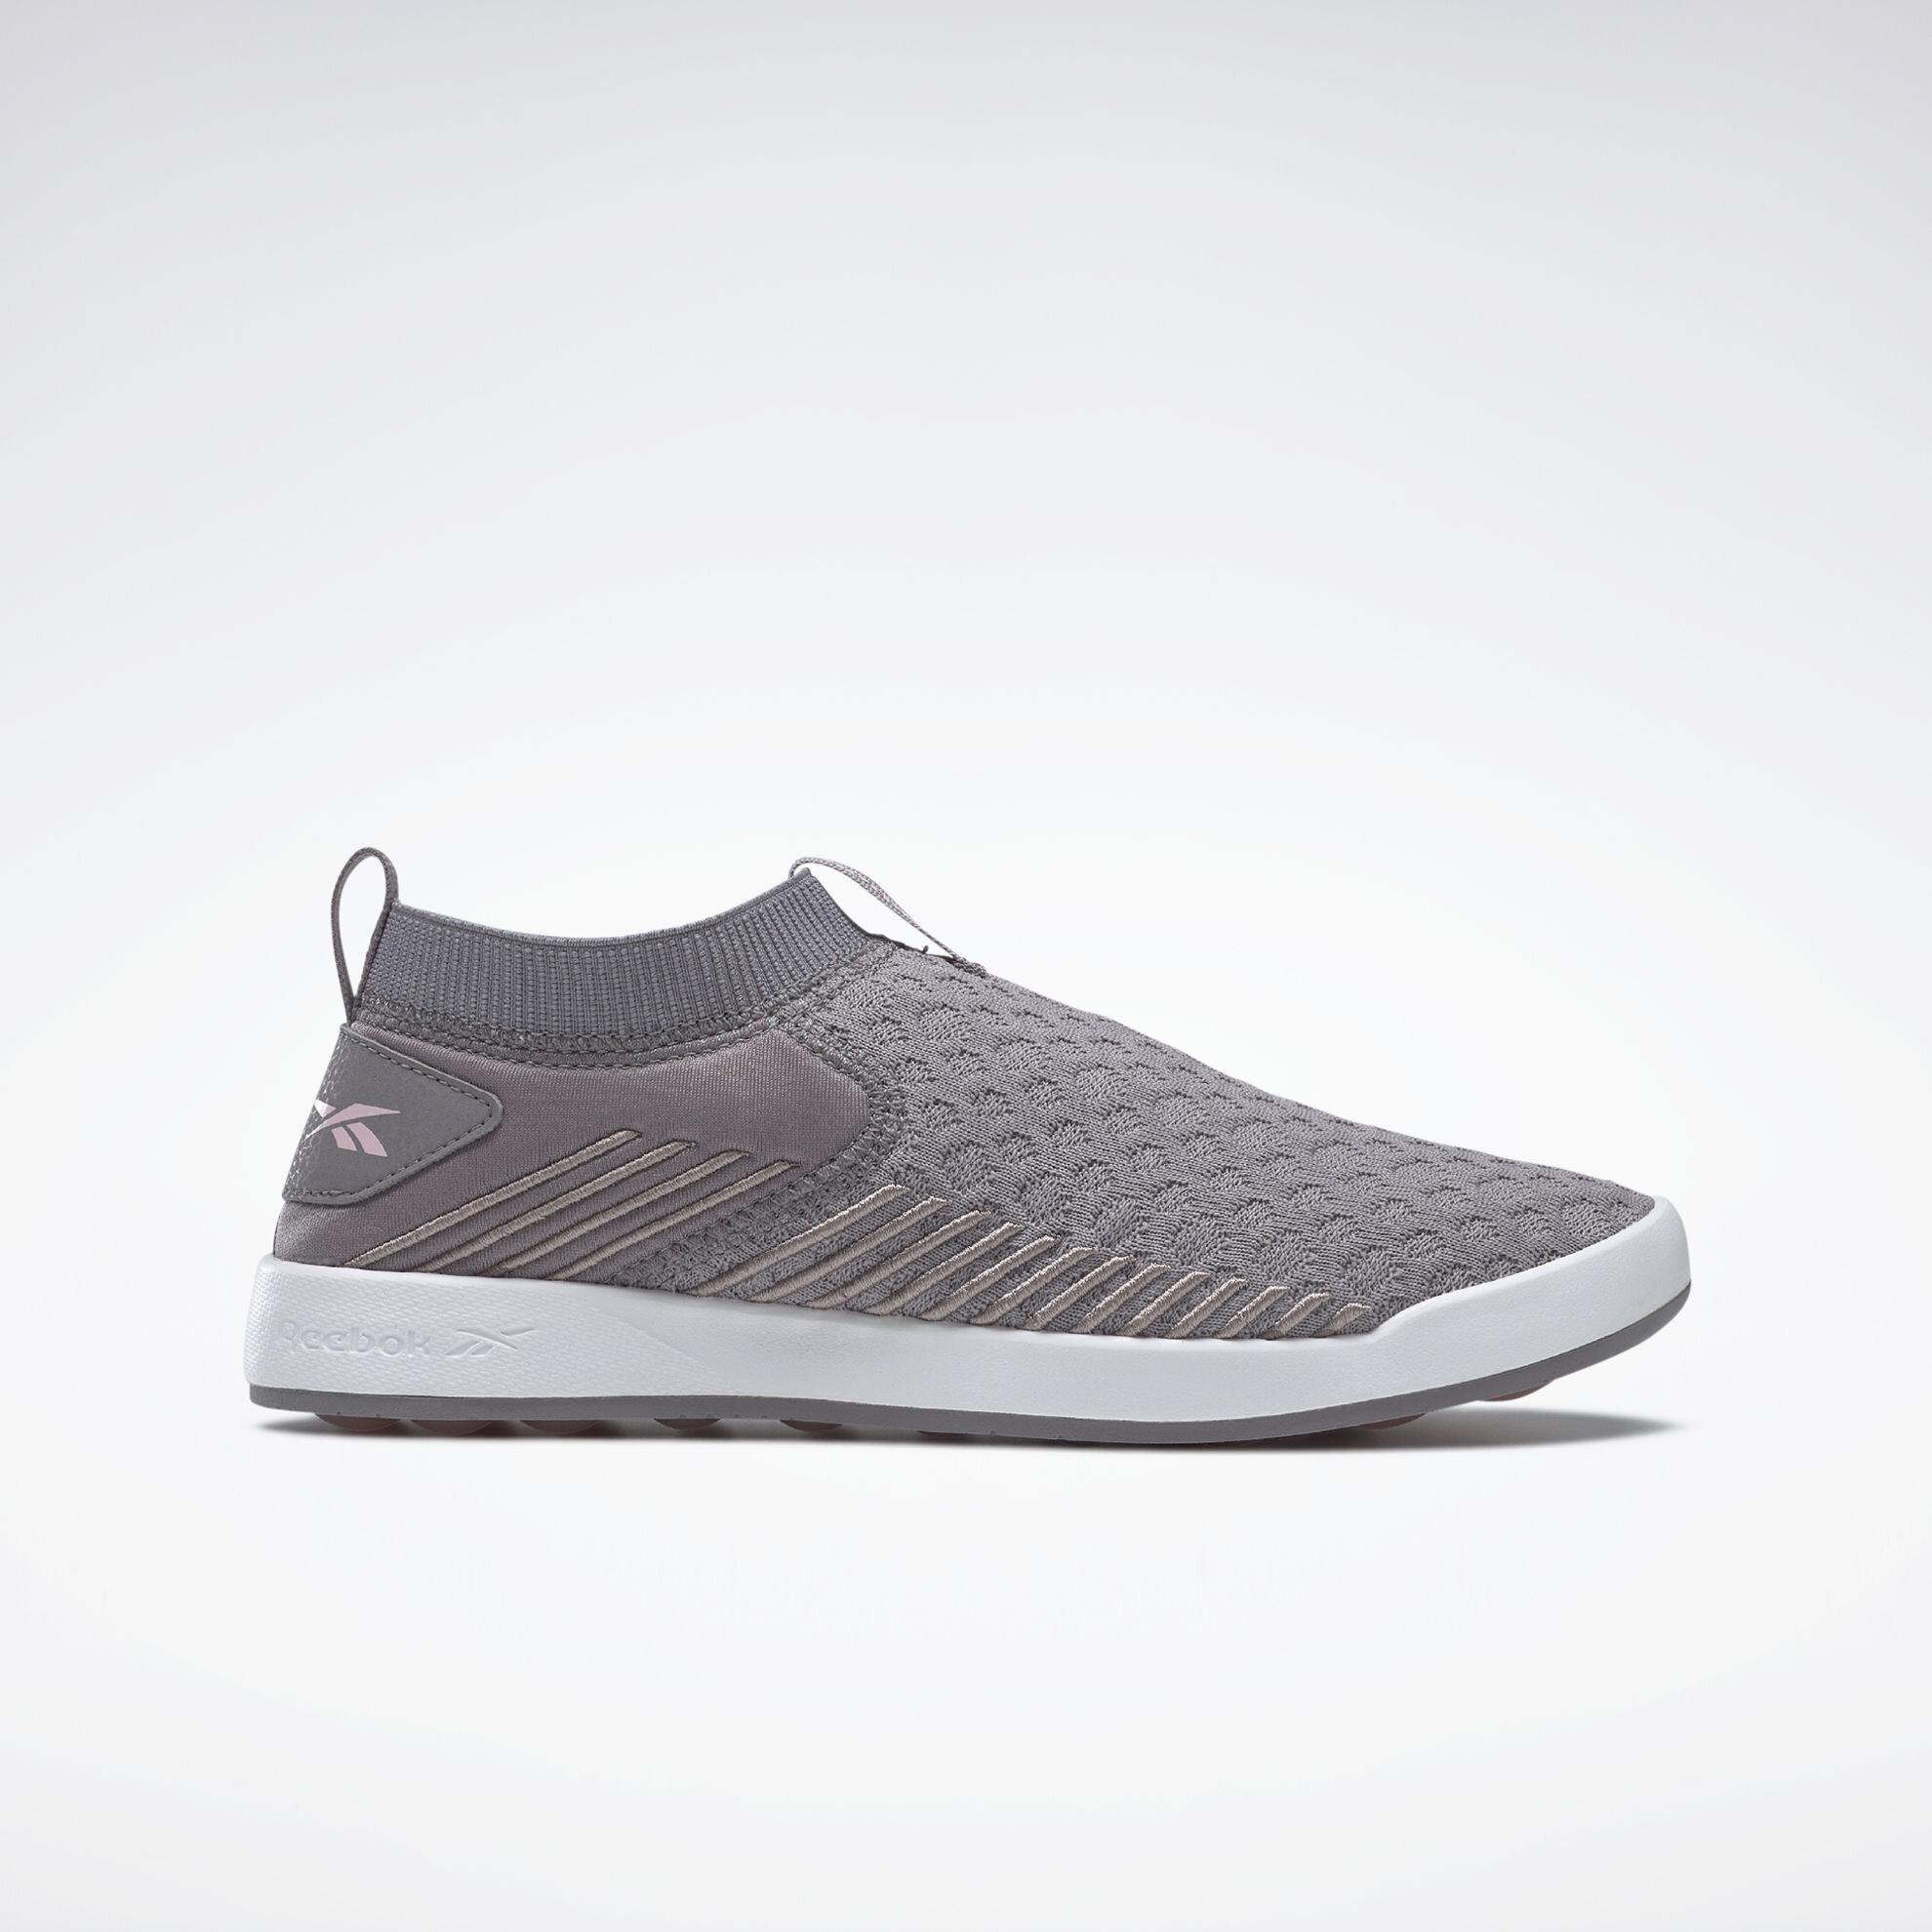 Reebok Ever Road DMX Slip-On Shoes